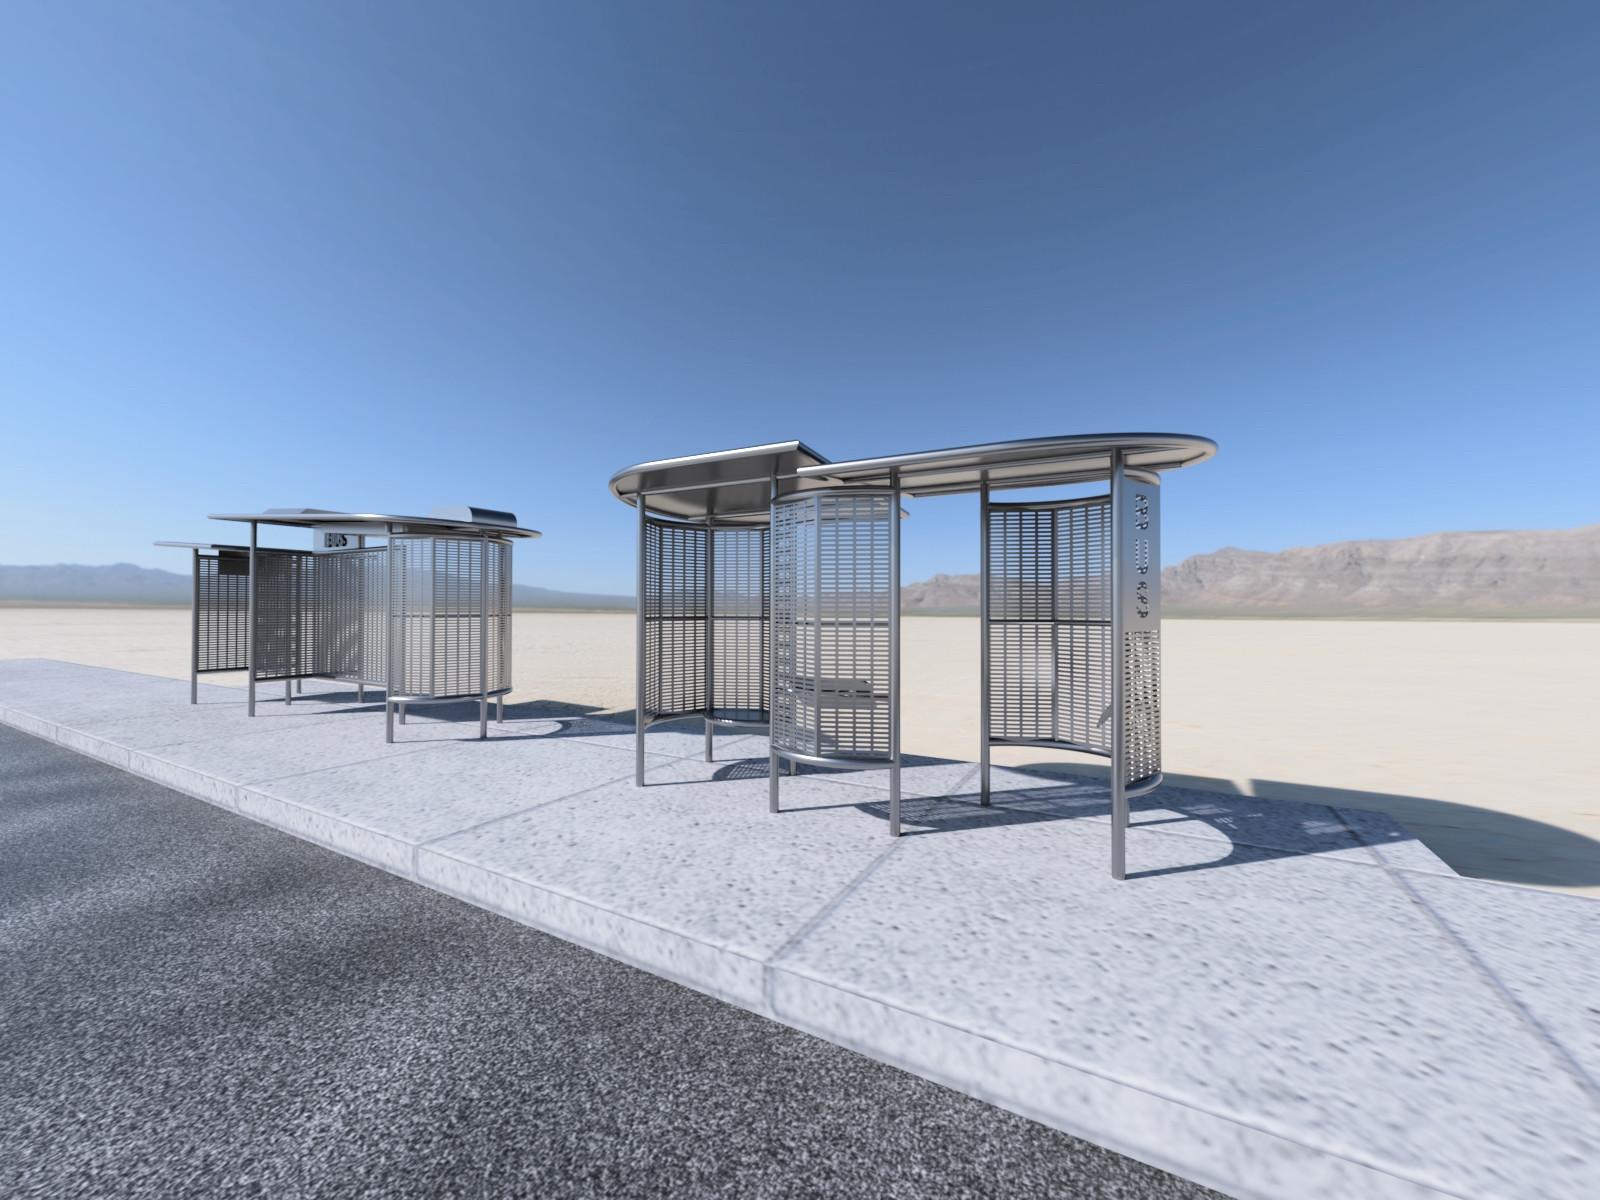 City of Phoenix Bus Stops